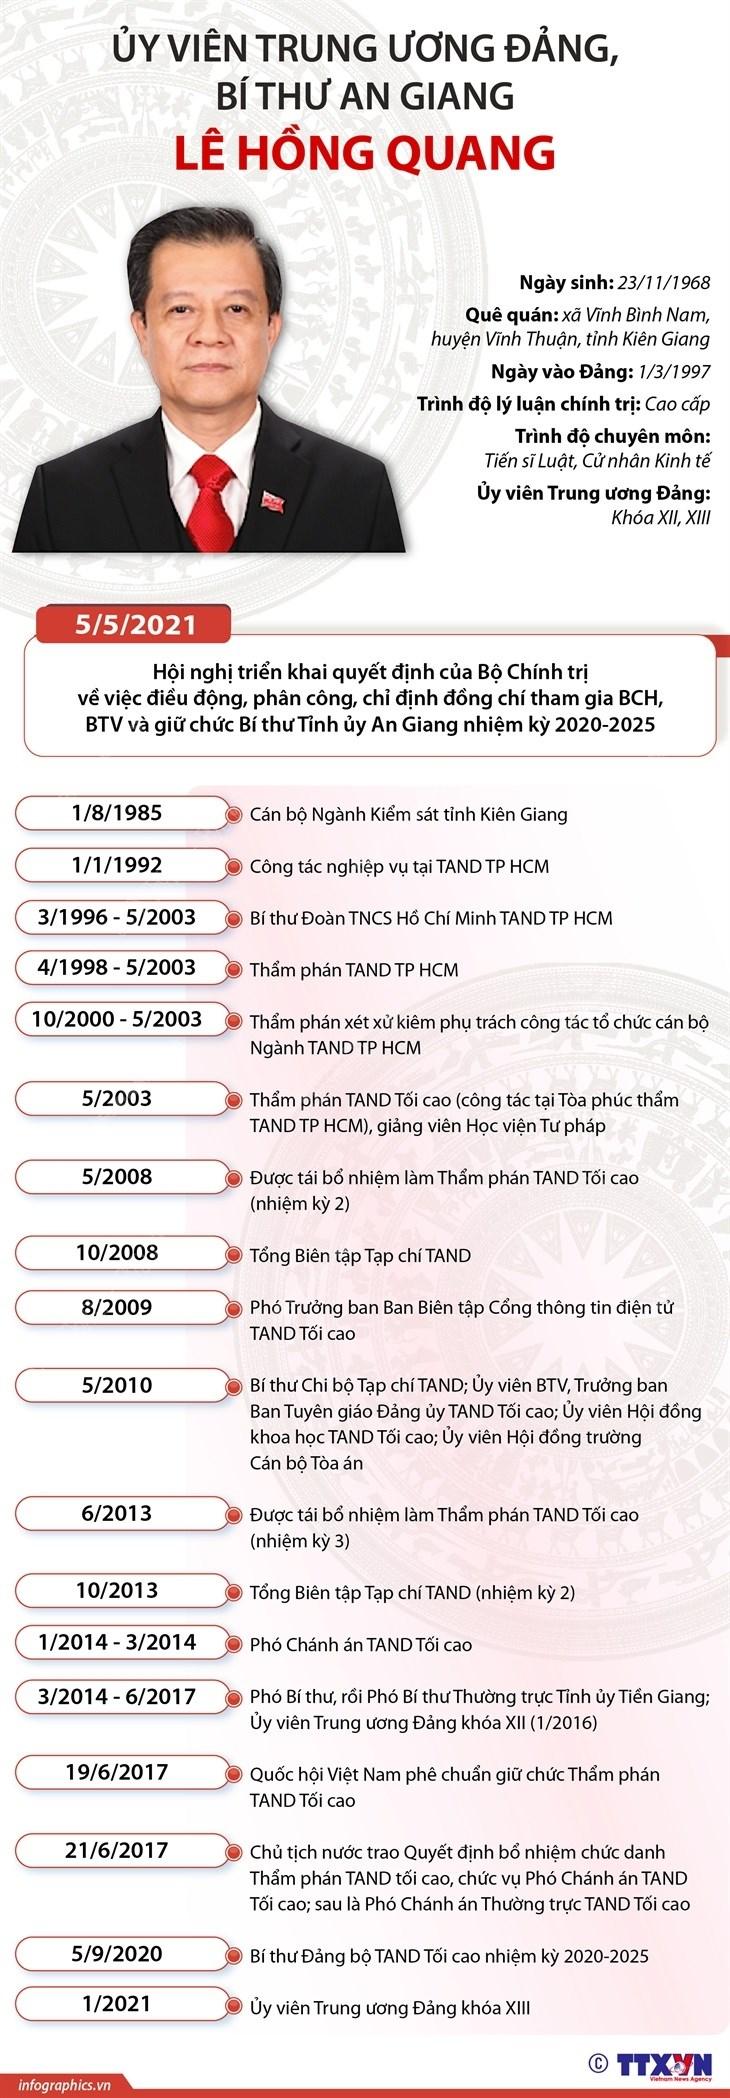 [Infographics] Uy vien Trung uong Dang, Bi thu An Giang Le Hong Quang hinh anh 1